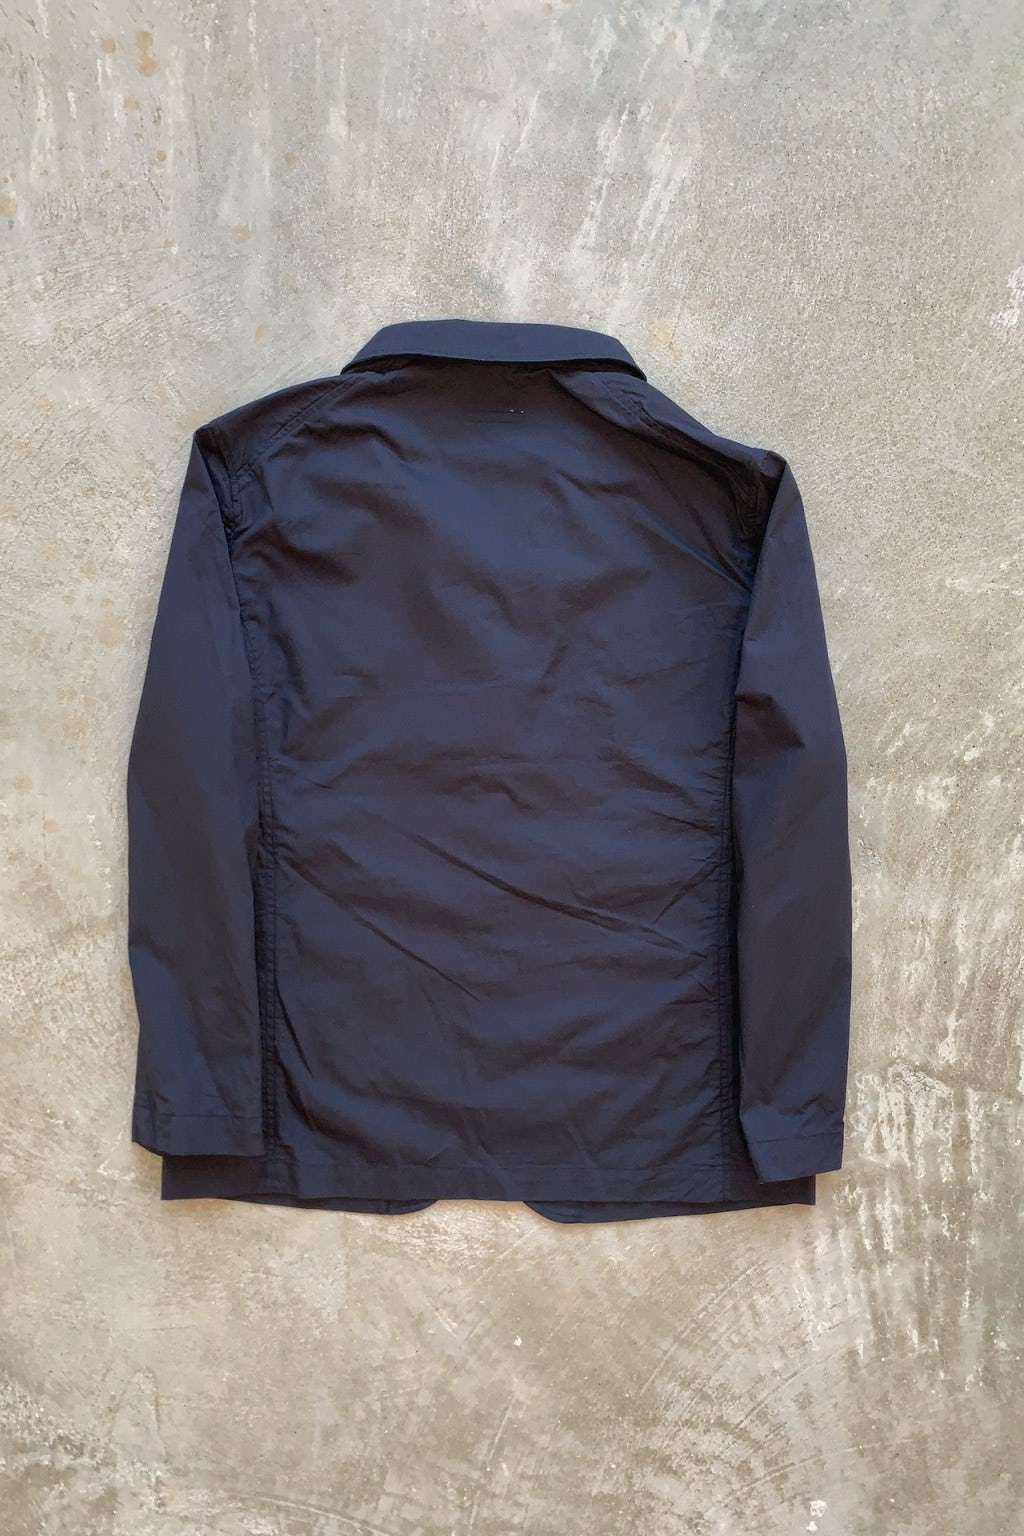 Engineered Garments New Bedford Dark Navy Highcount Twill